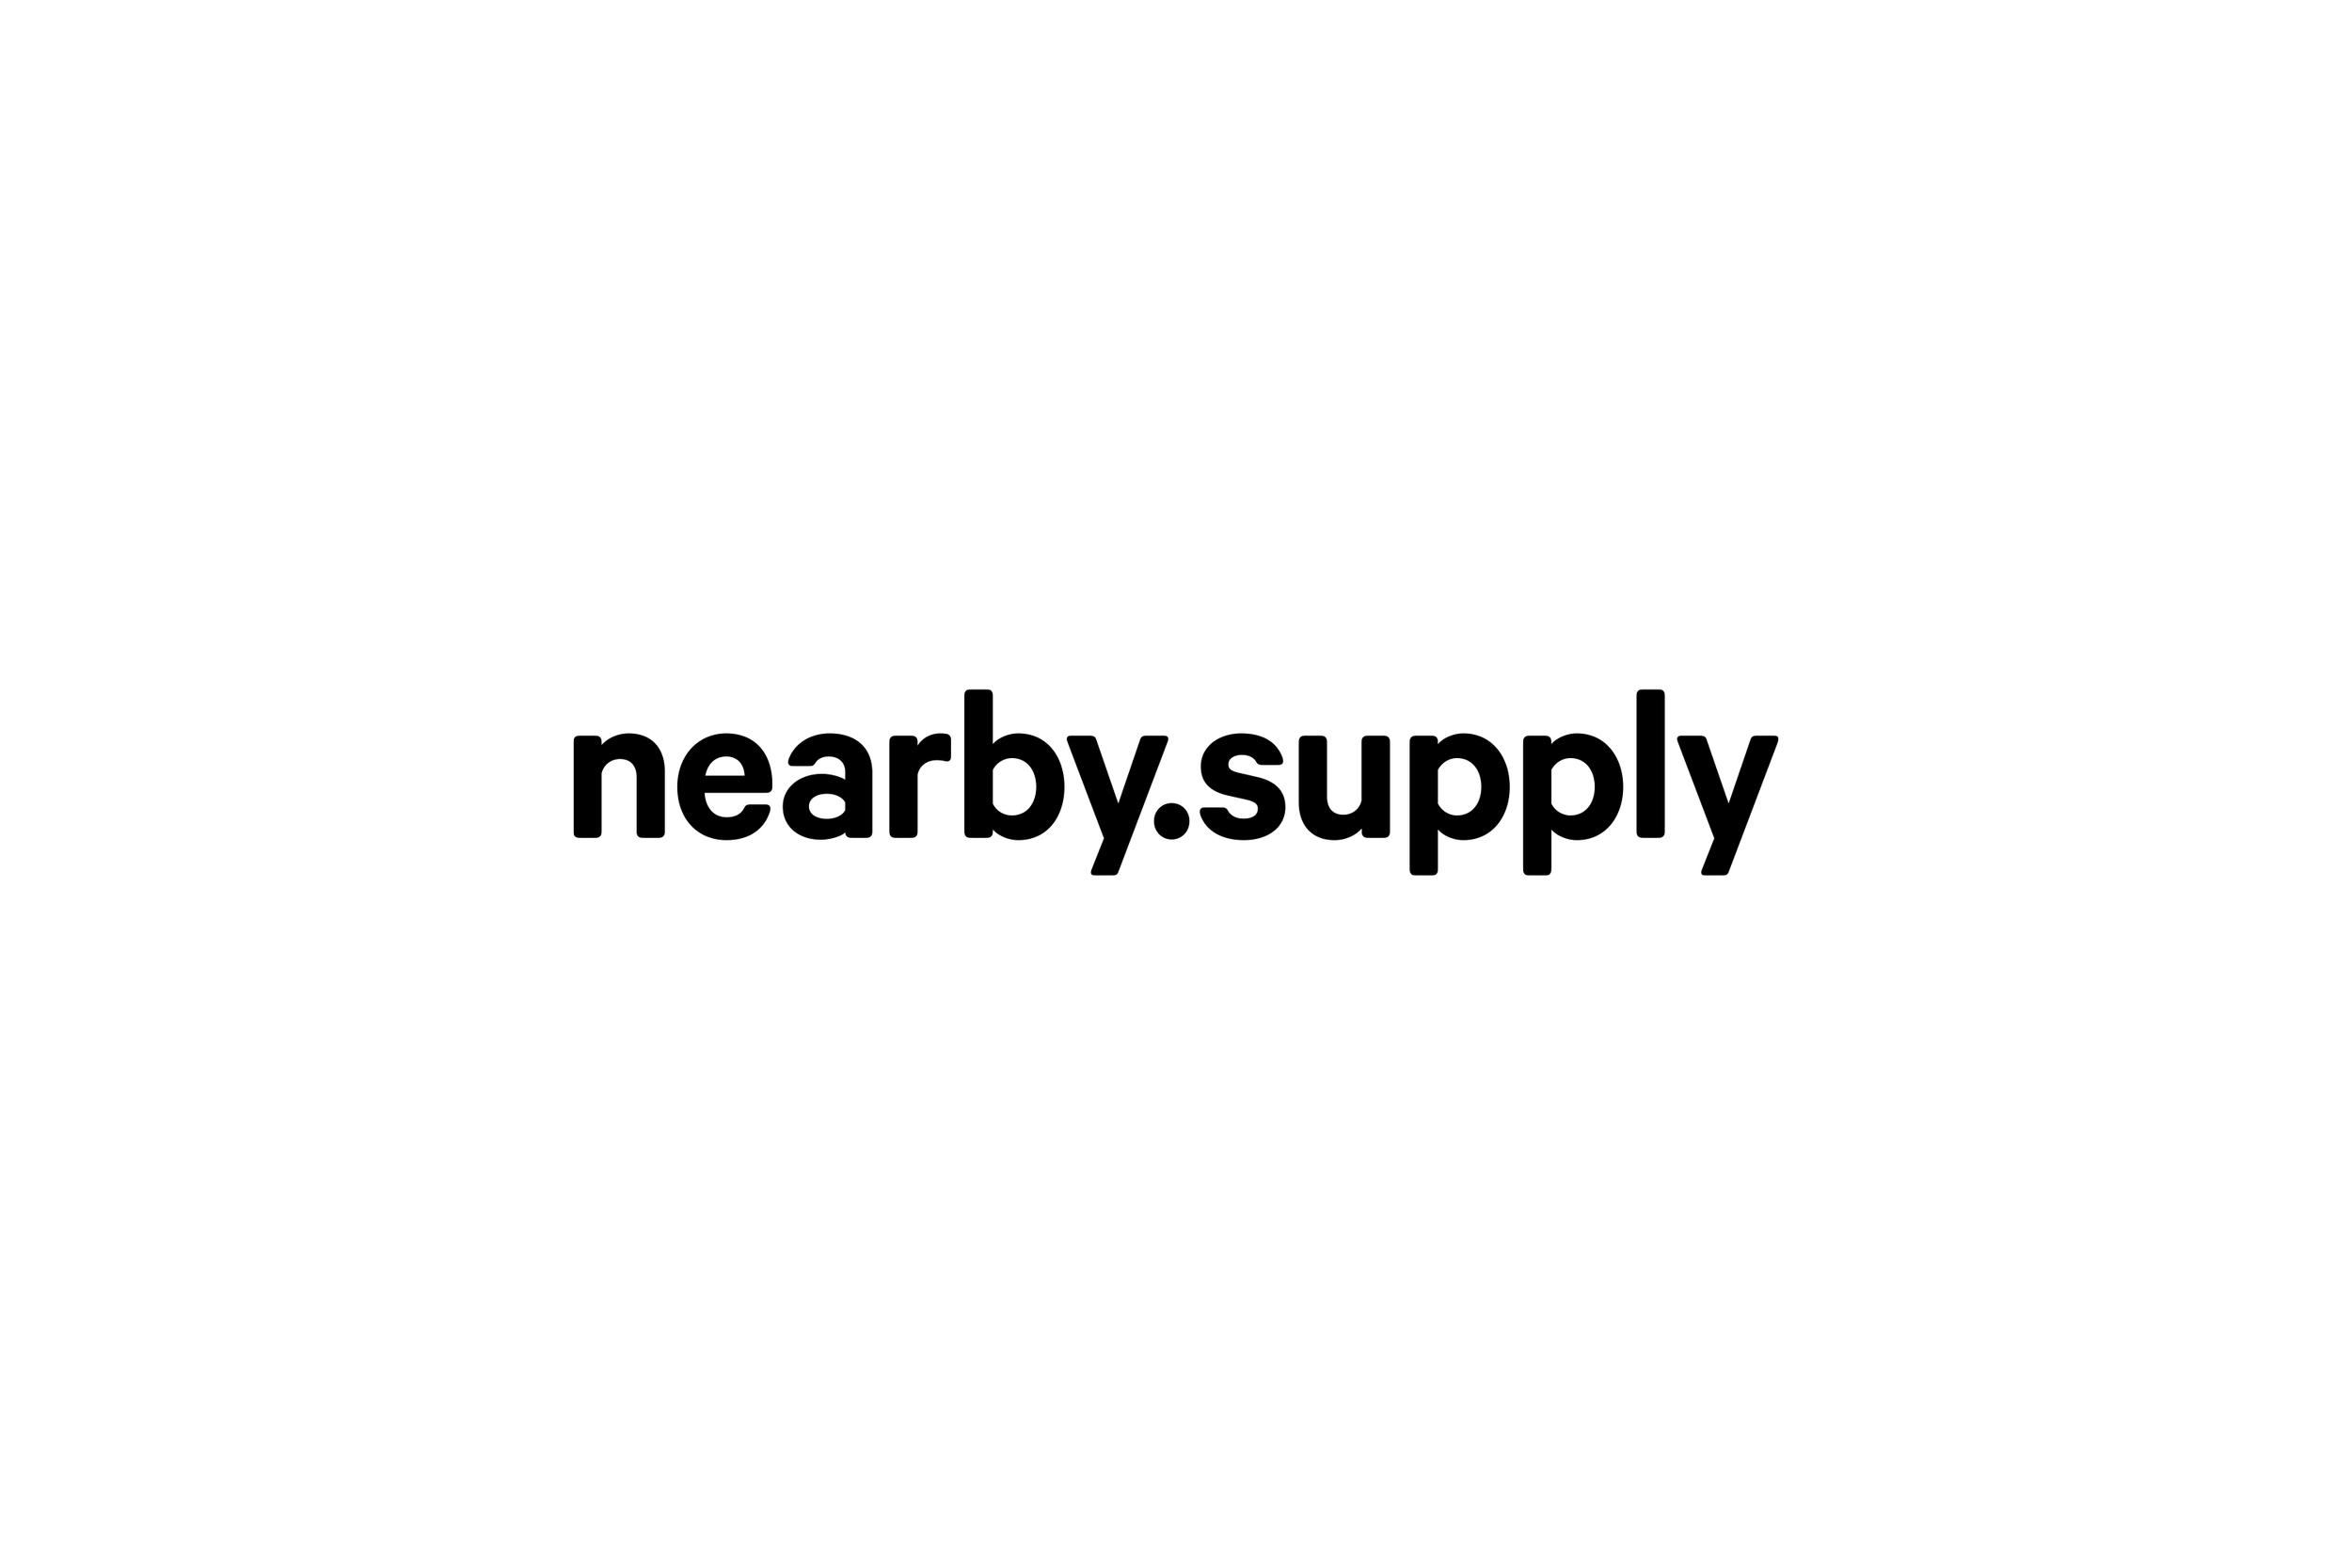 nearby.supply-logo-type-black.jpg